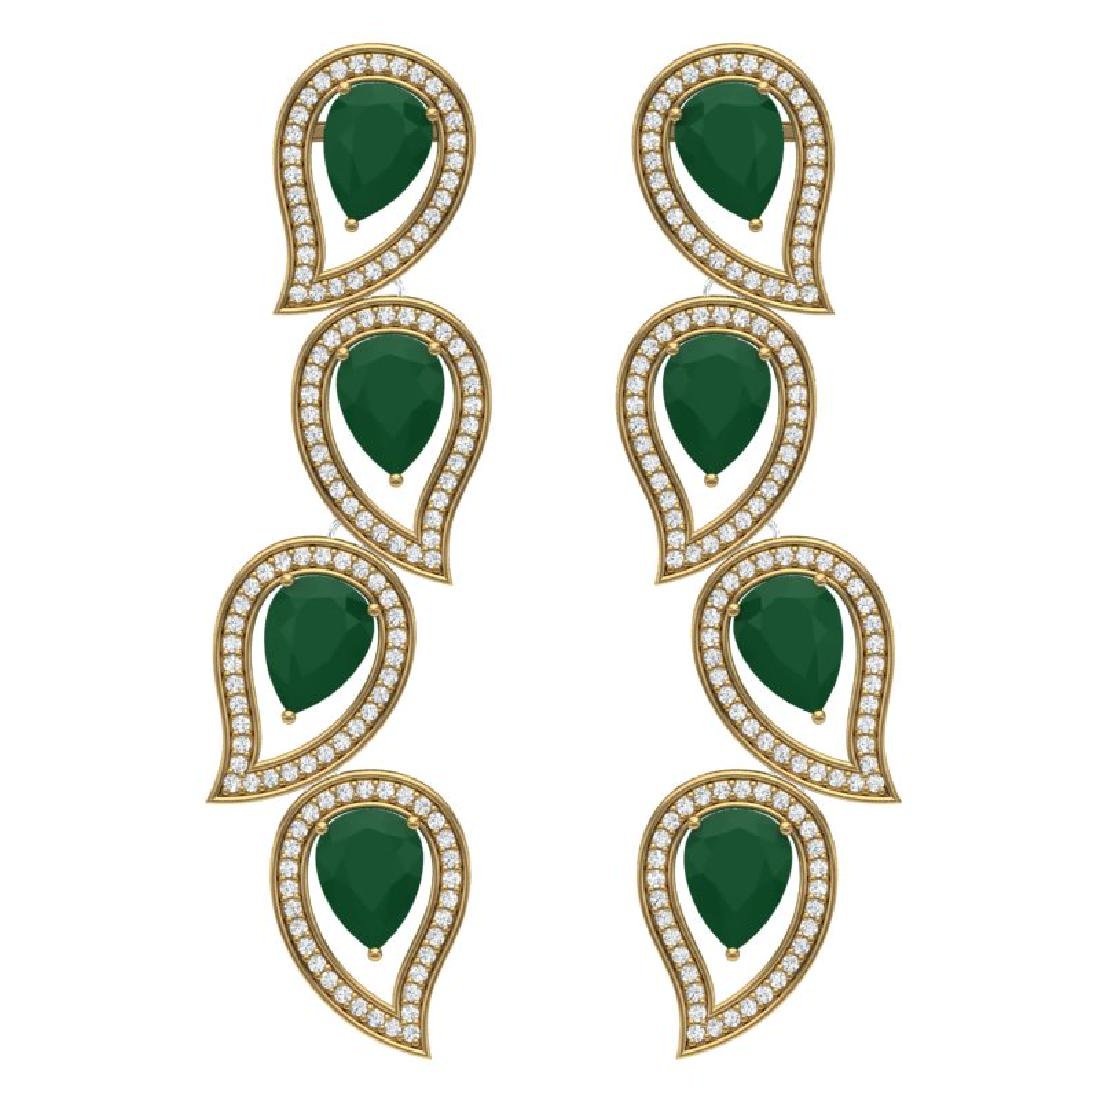 16.44 CTW Royalty Emerald & VS Diamond Earrings 18K